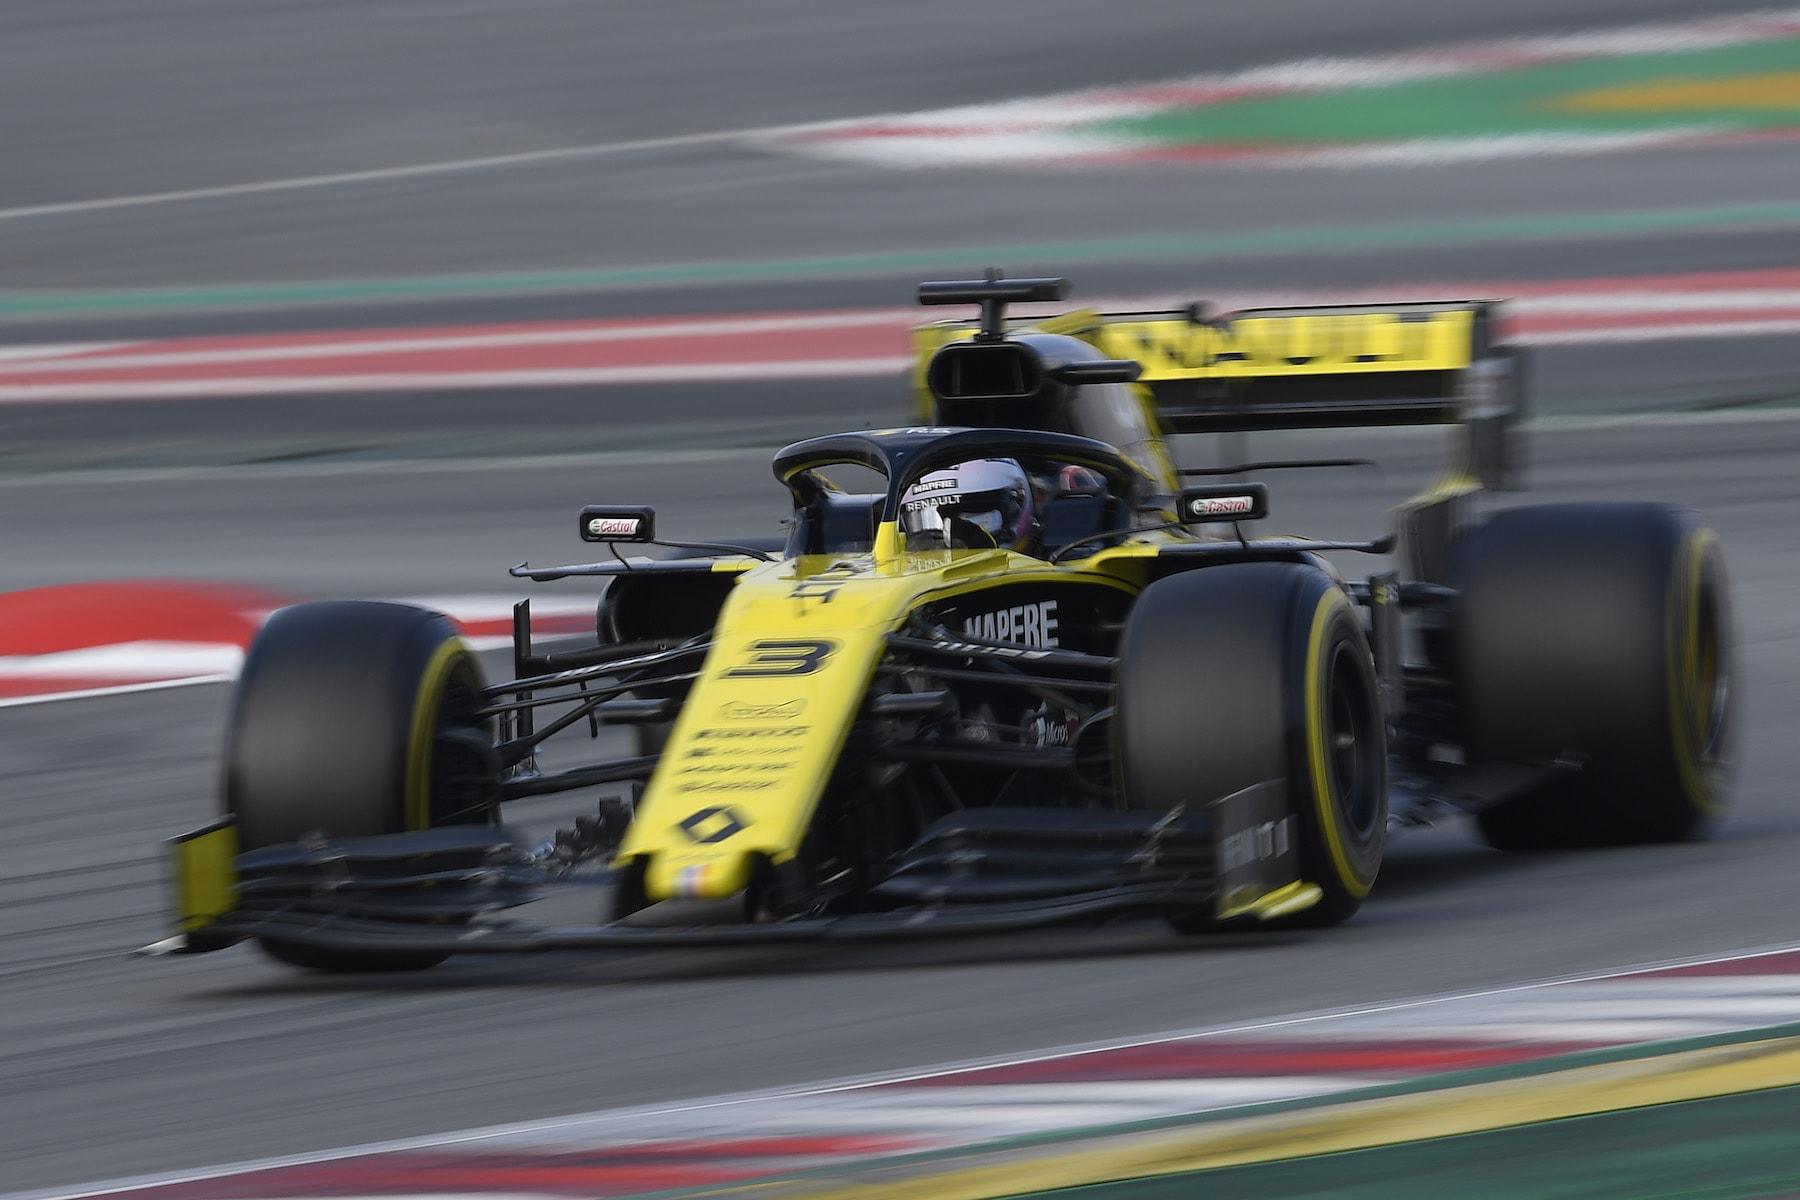 2019 Daniel Ricciardo   Renault RS19   2019 Barcelona T1 D2 1 copy.jpg